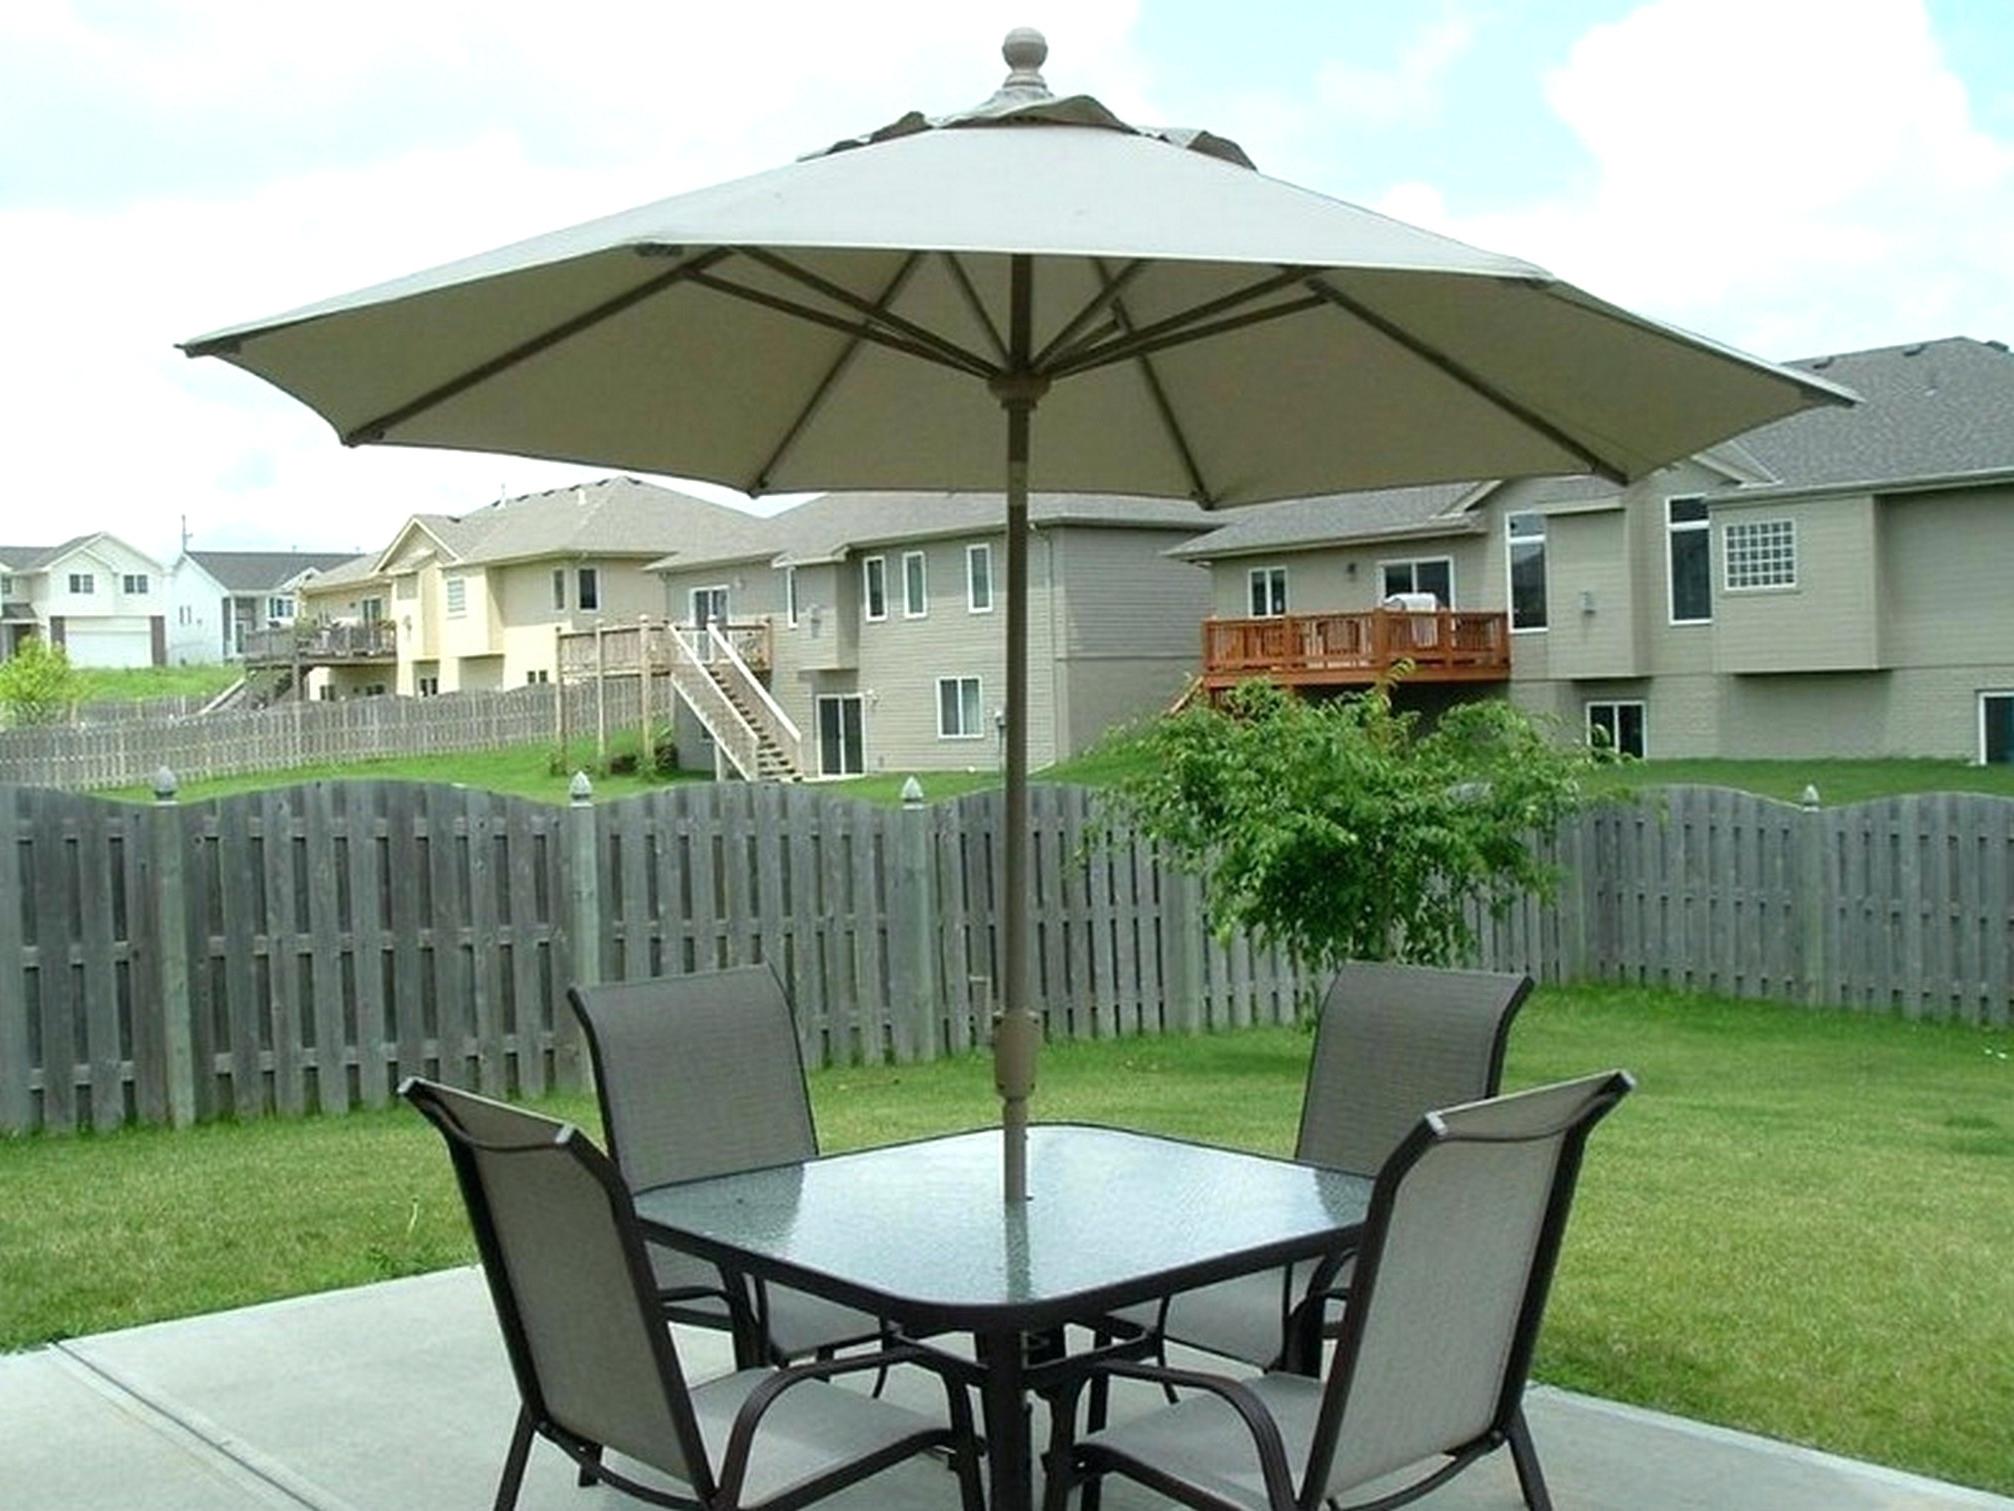 Sunbrella Teak Umbrellas With Fashionable Tips: Best Frontgate Umbrellas With Sunbrella Striped Patio Umbrella (View 20 of 20)